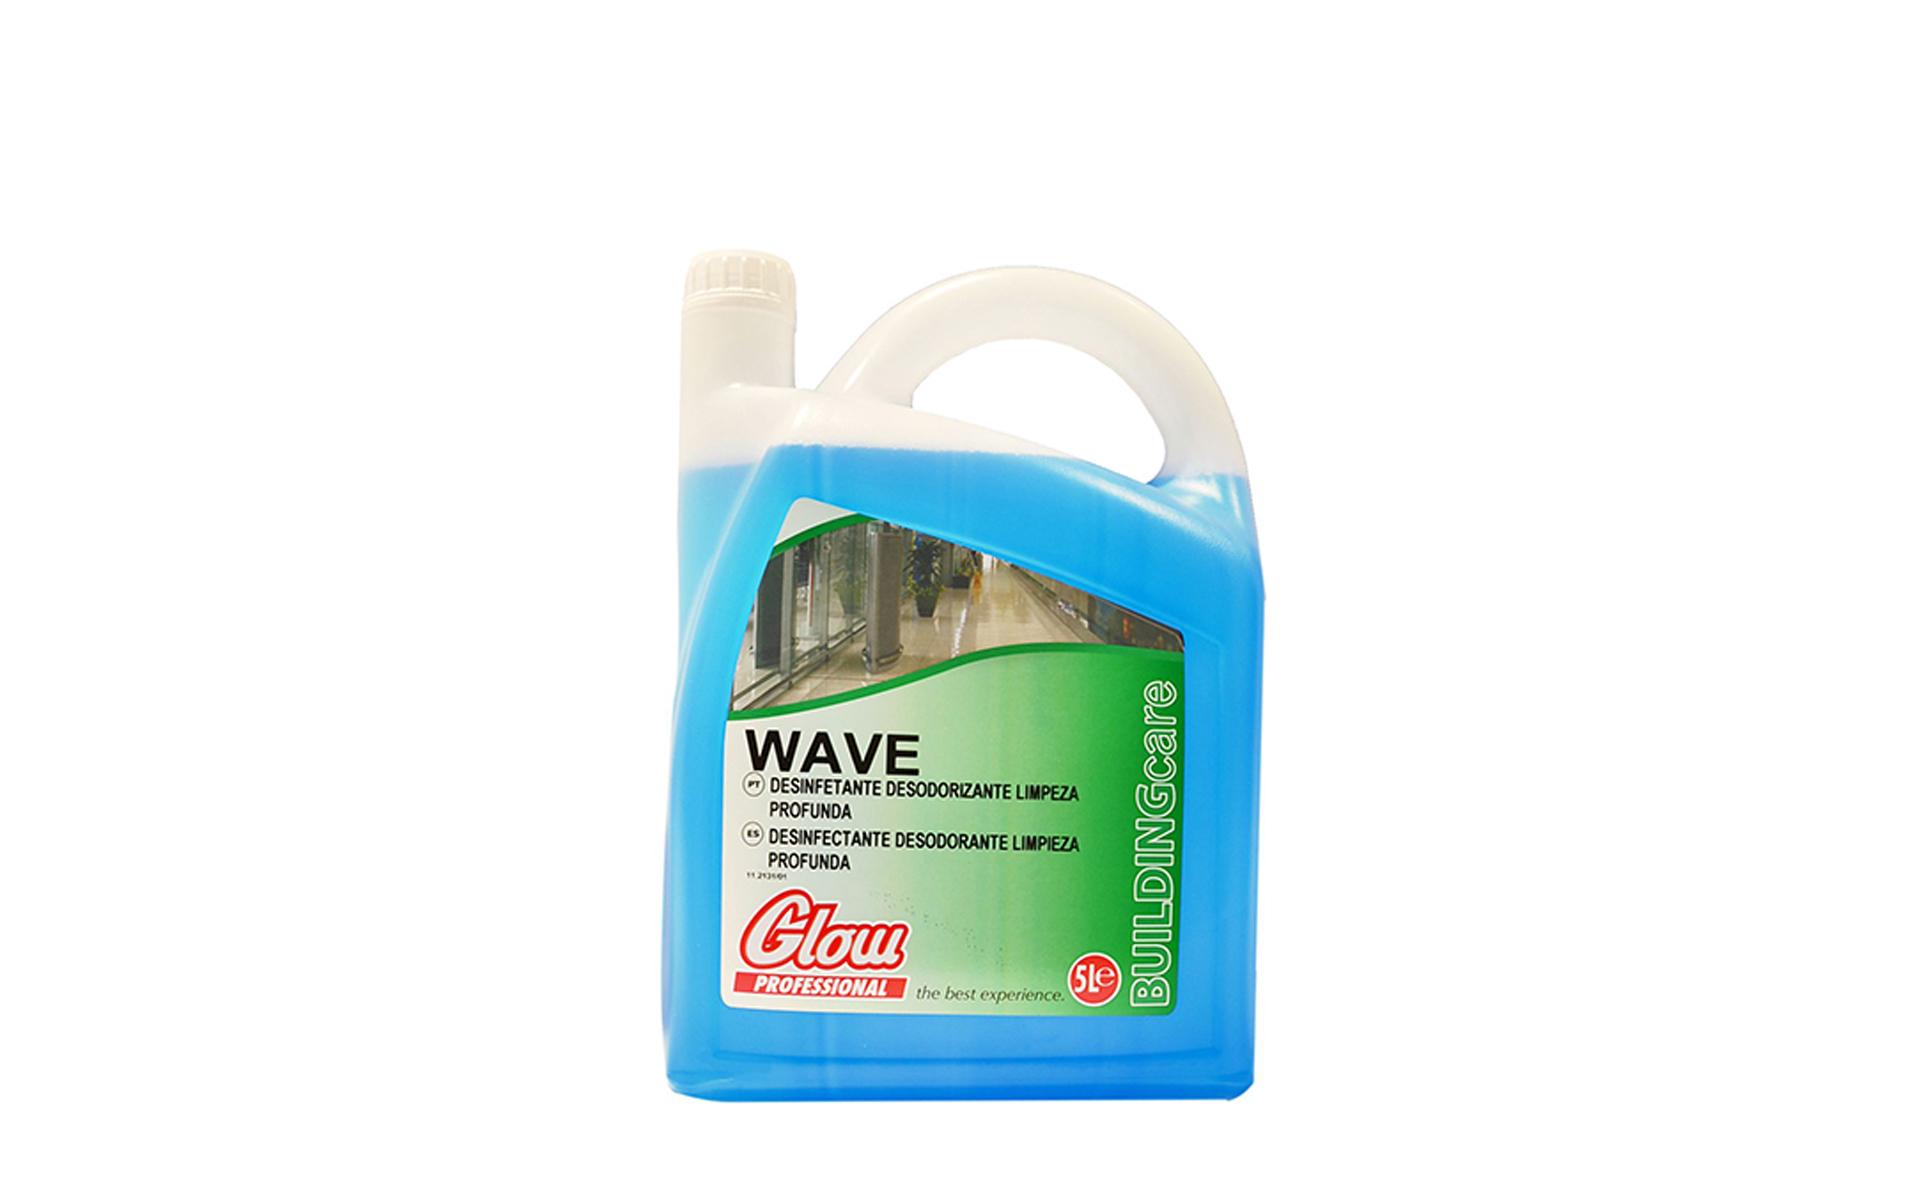 Desinfectante limpieza profunda 5 litros